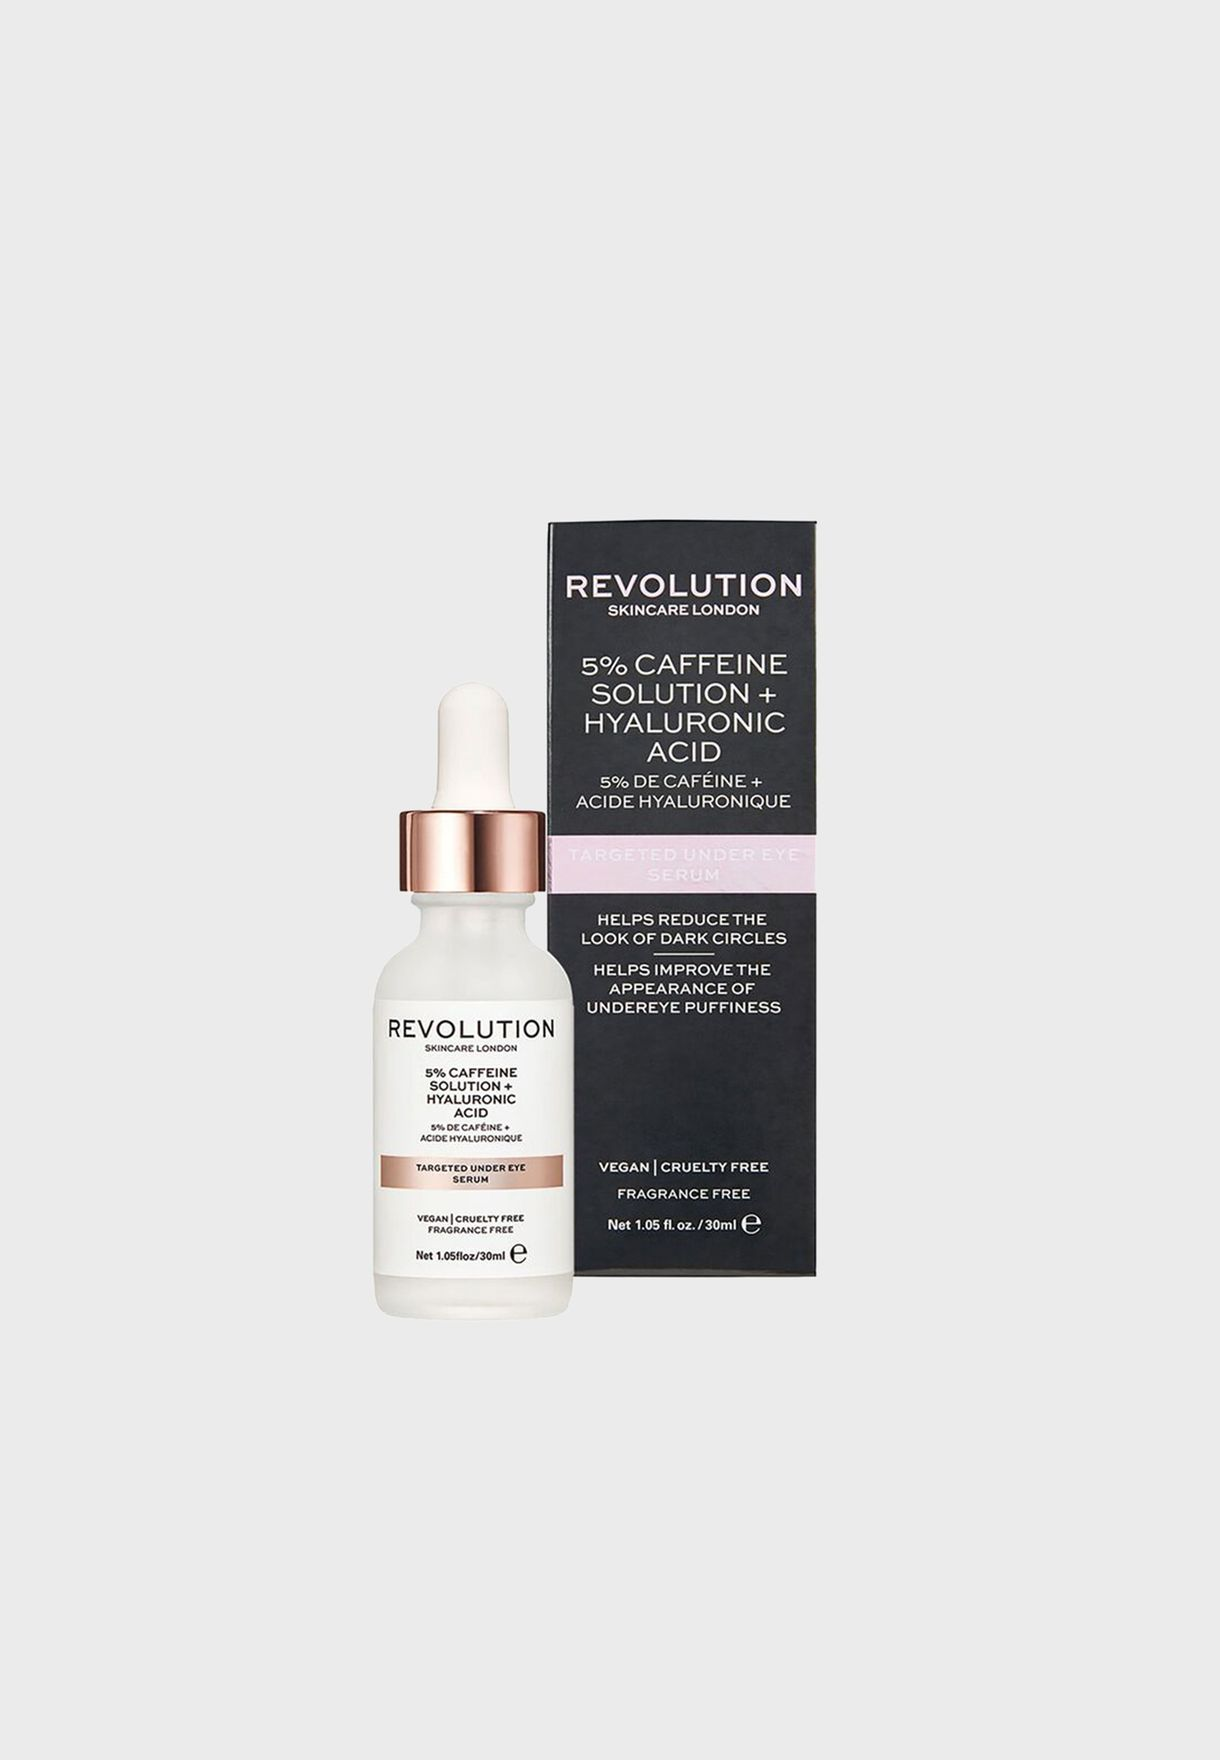 Revolution Skincare Targeted Under Eye Serum - 5% Caffeine Solution + Hyaluronic Acid